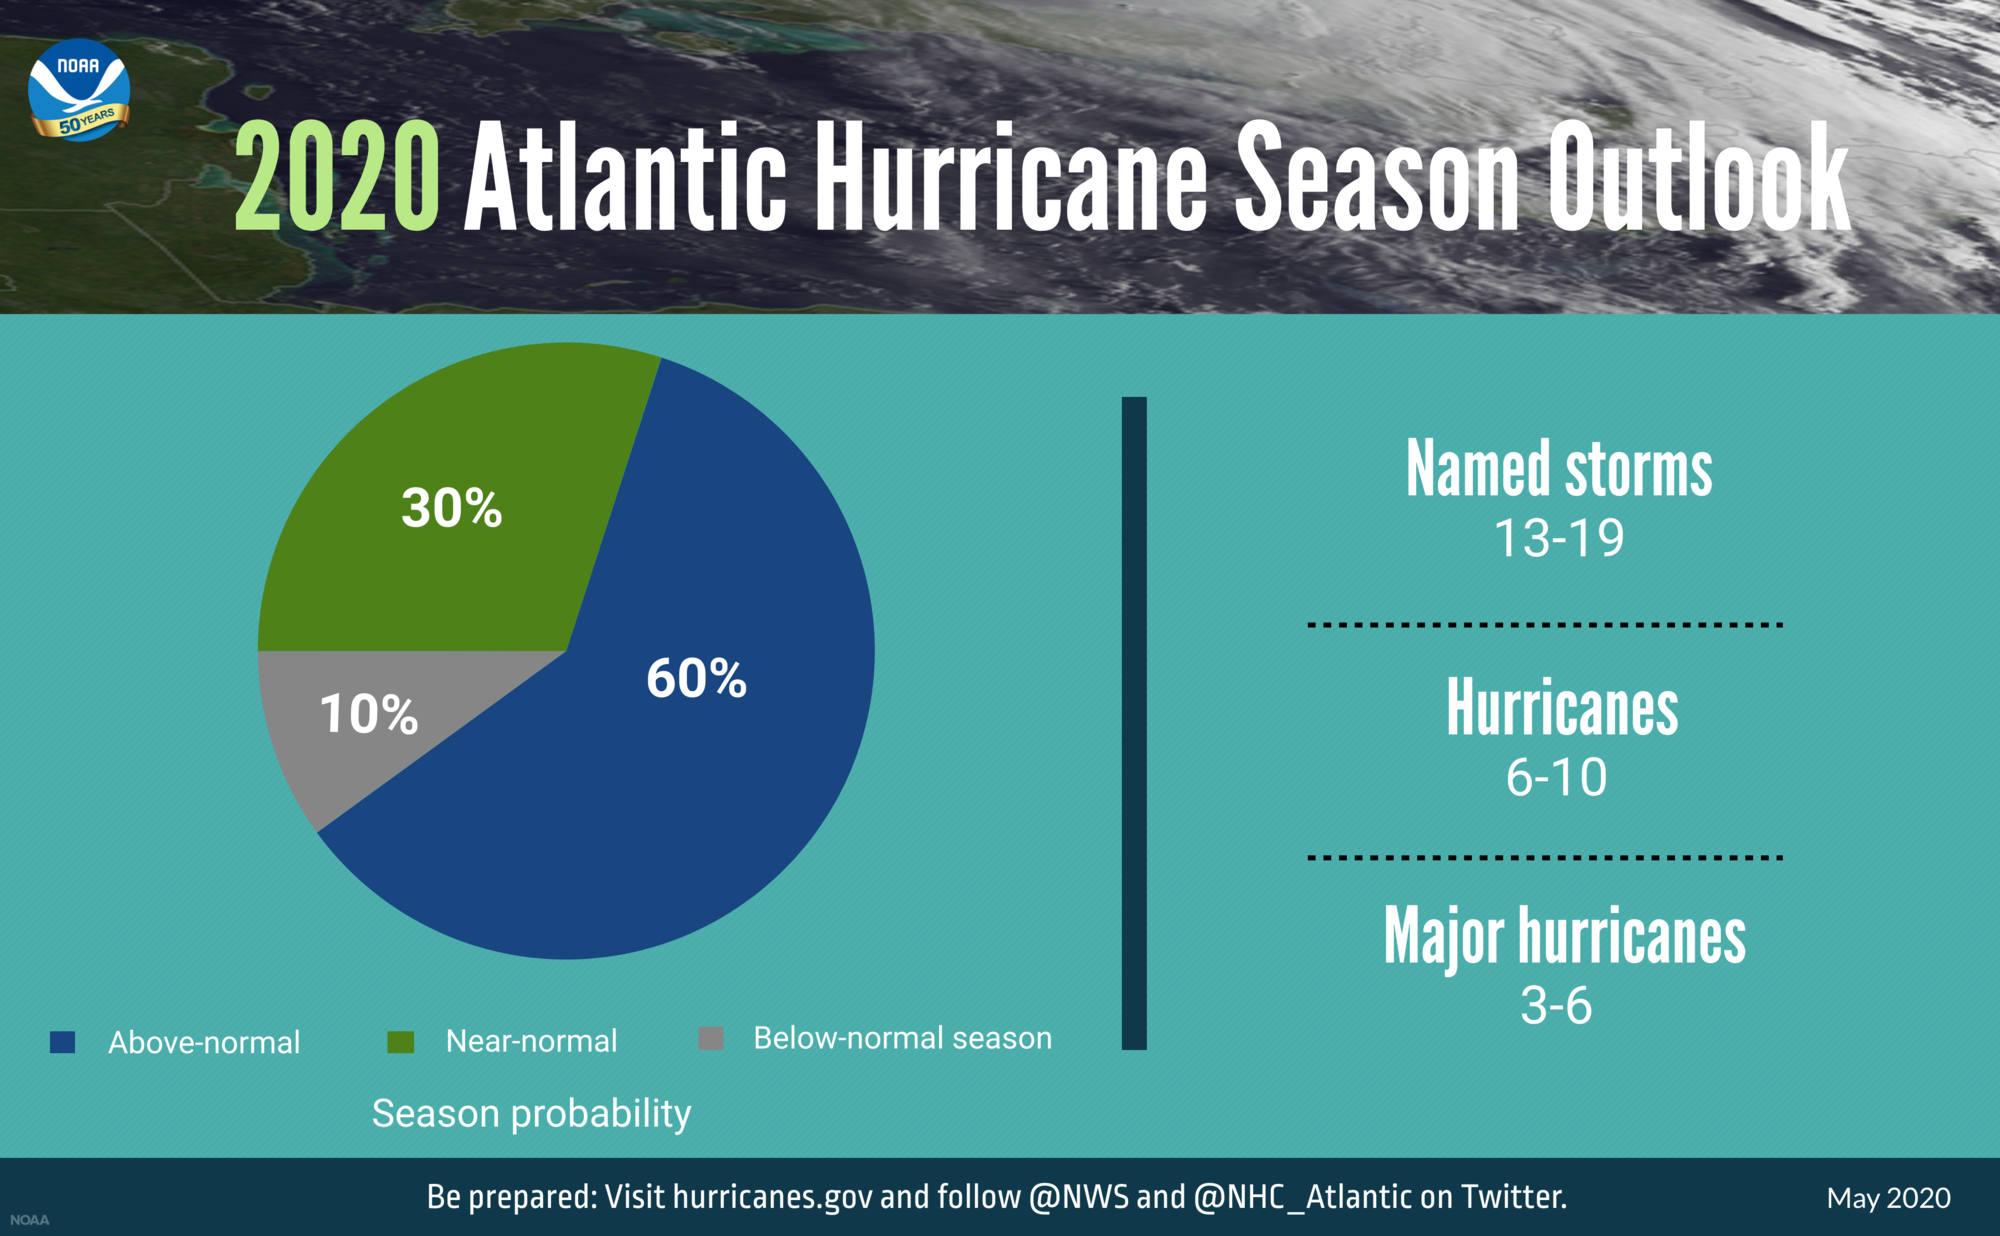 NOAA 2020 Hurricane Season